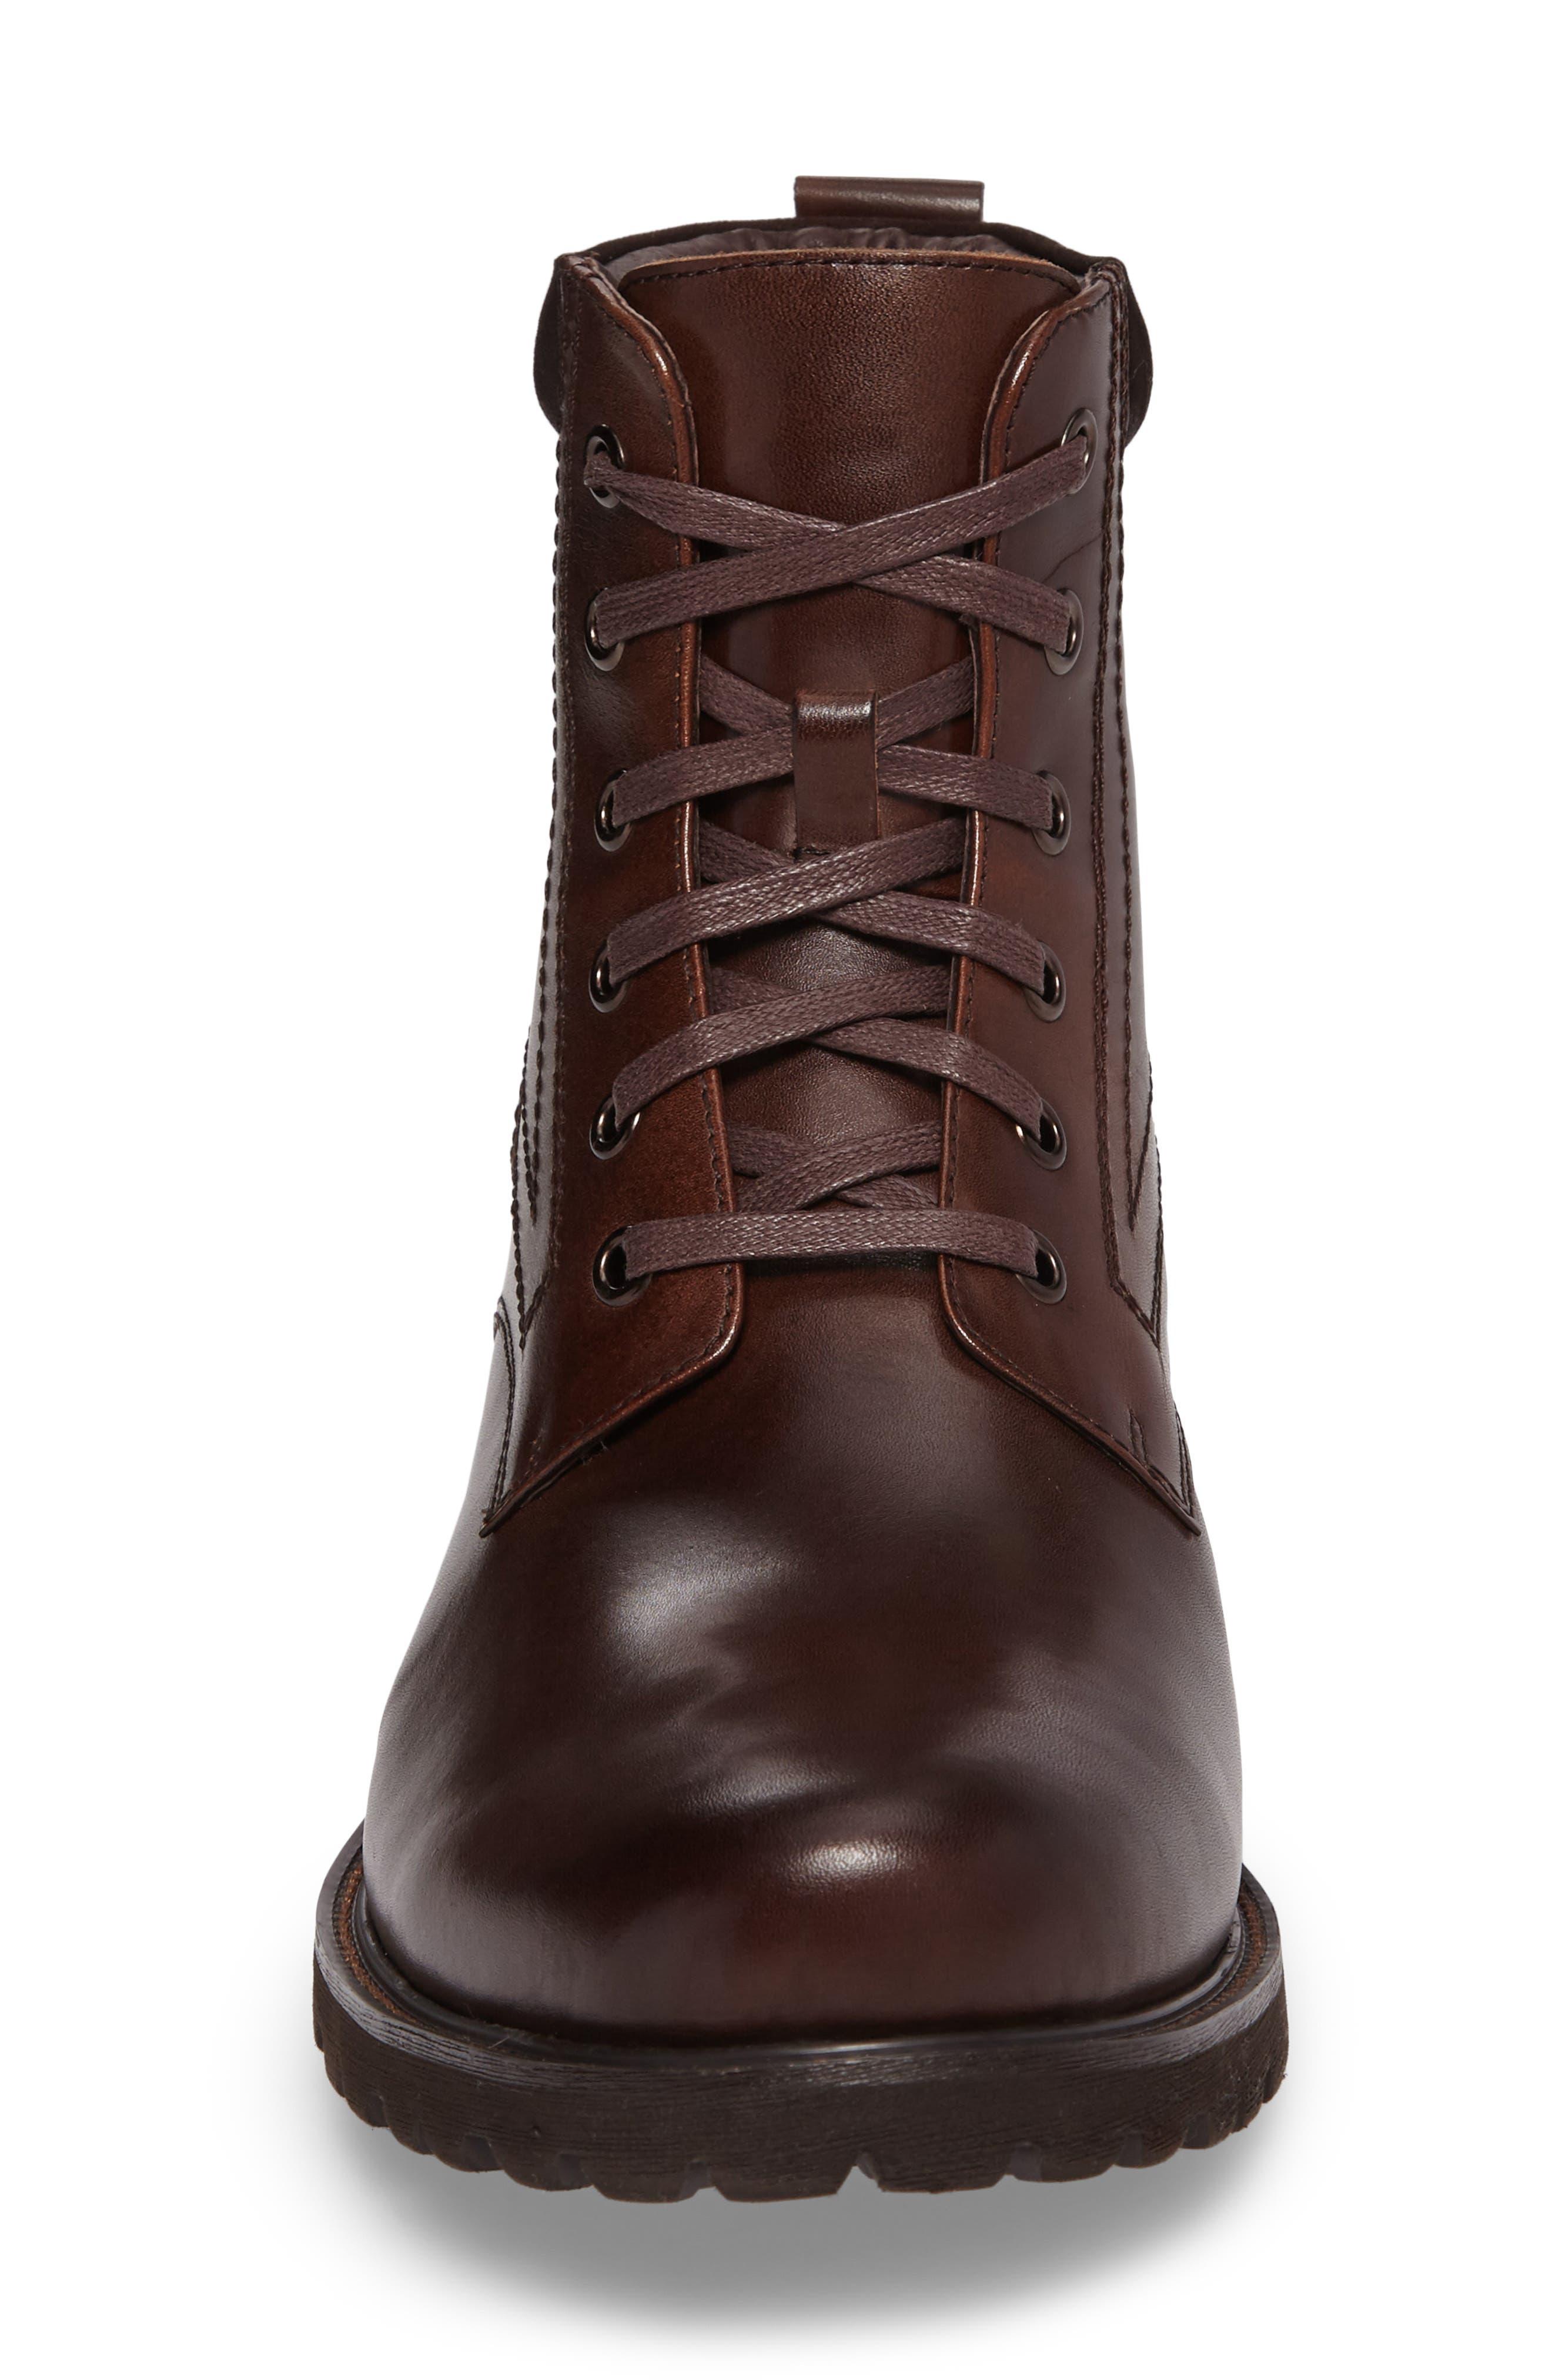 Keller Plain Toe Boot,                             Alternate thumbnail 4, color,                             Brown Leather